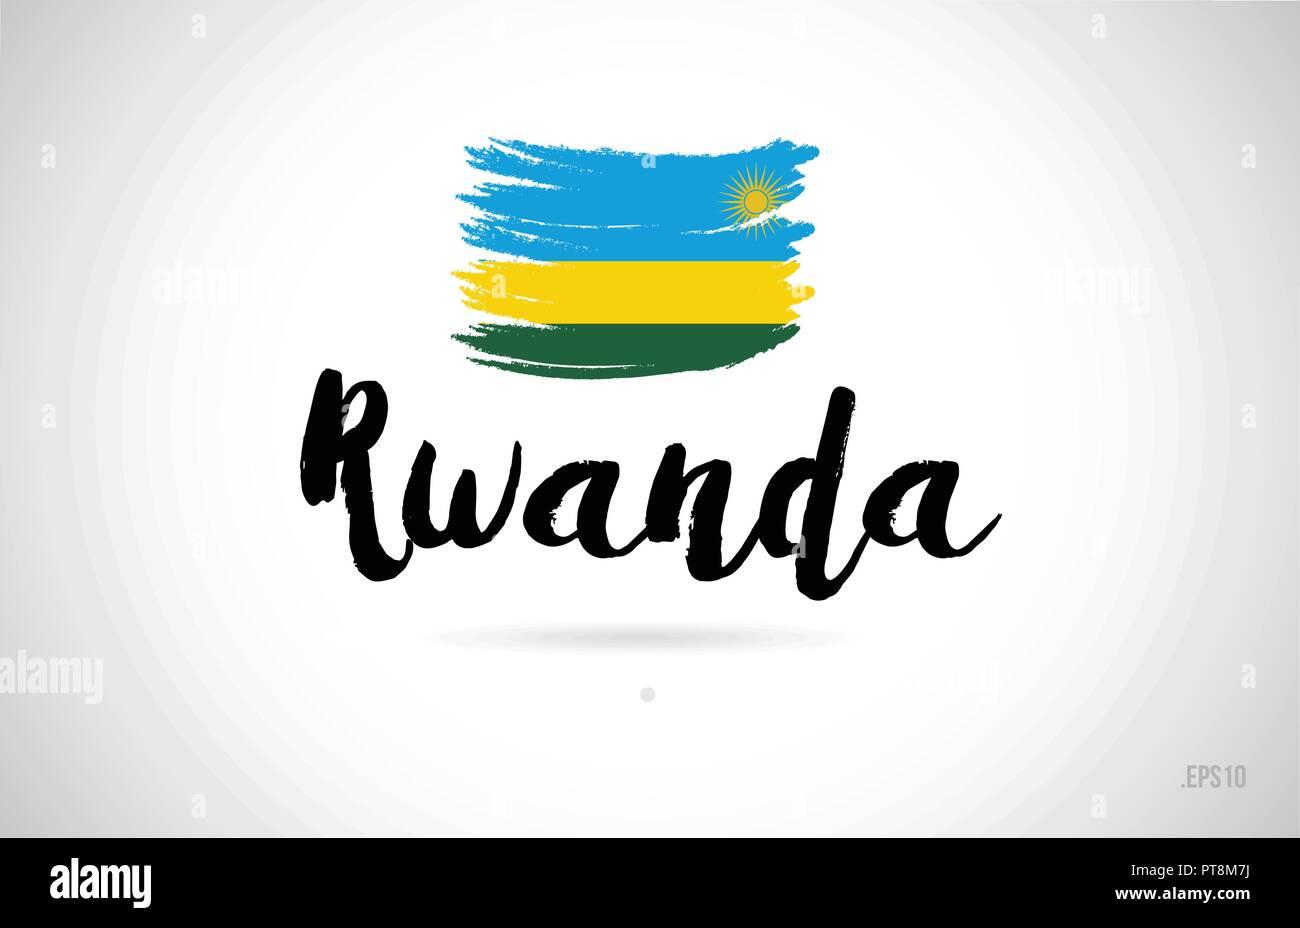 rwanda country flag concept with grunge design suitable for a logo icon design - Stock Vector